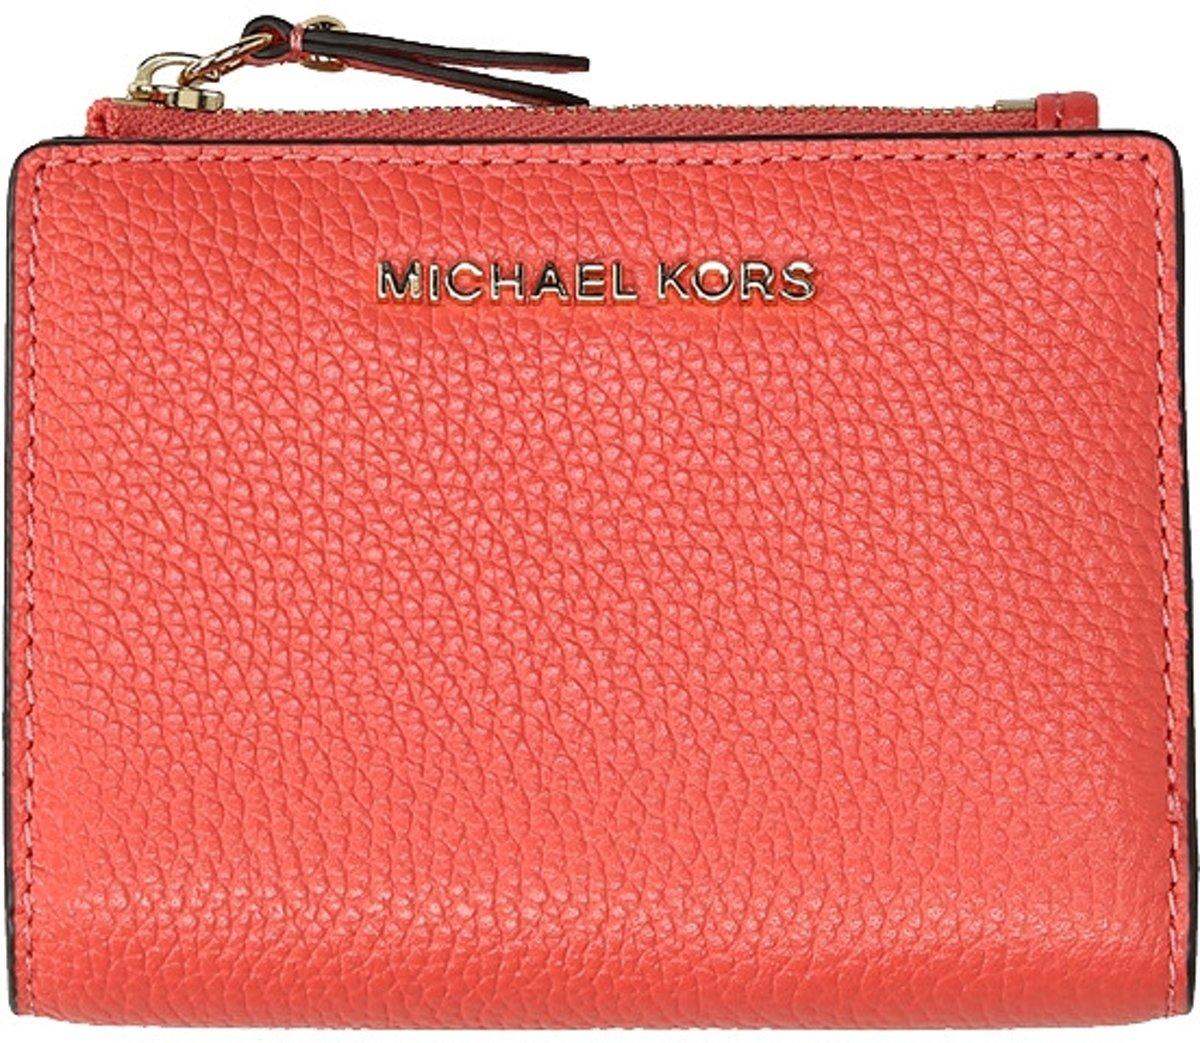 Michael Kors Jet Set Snap portemonnee grapefruit